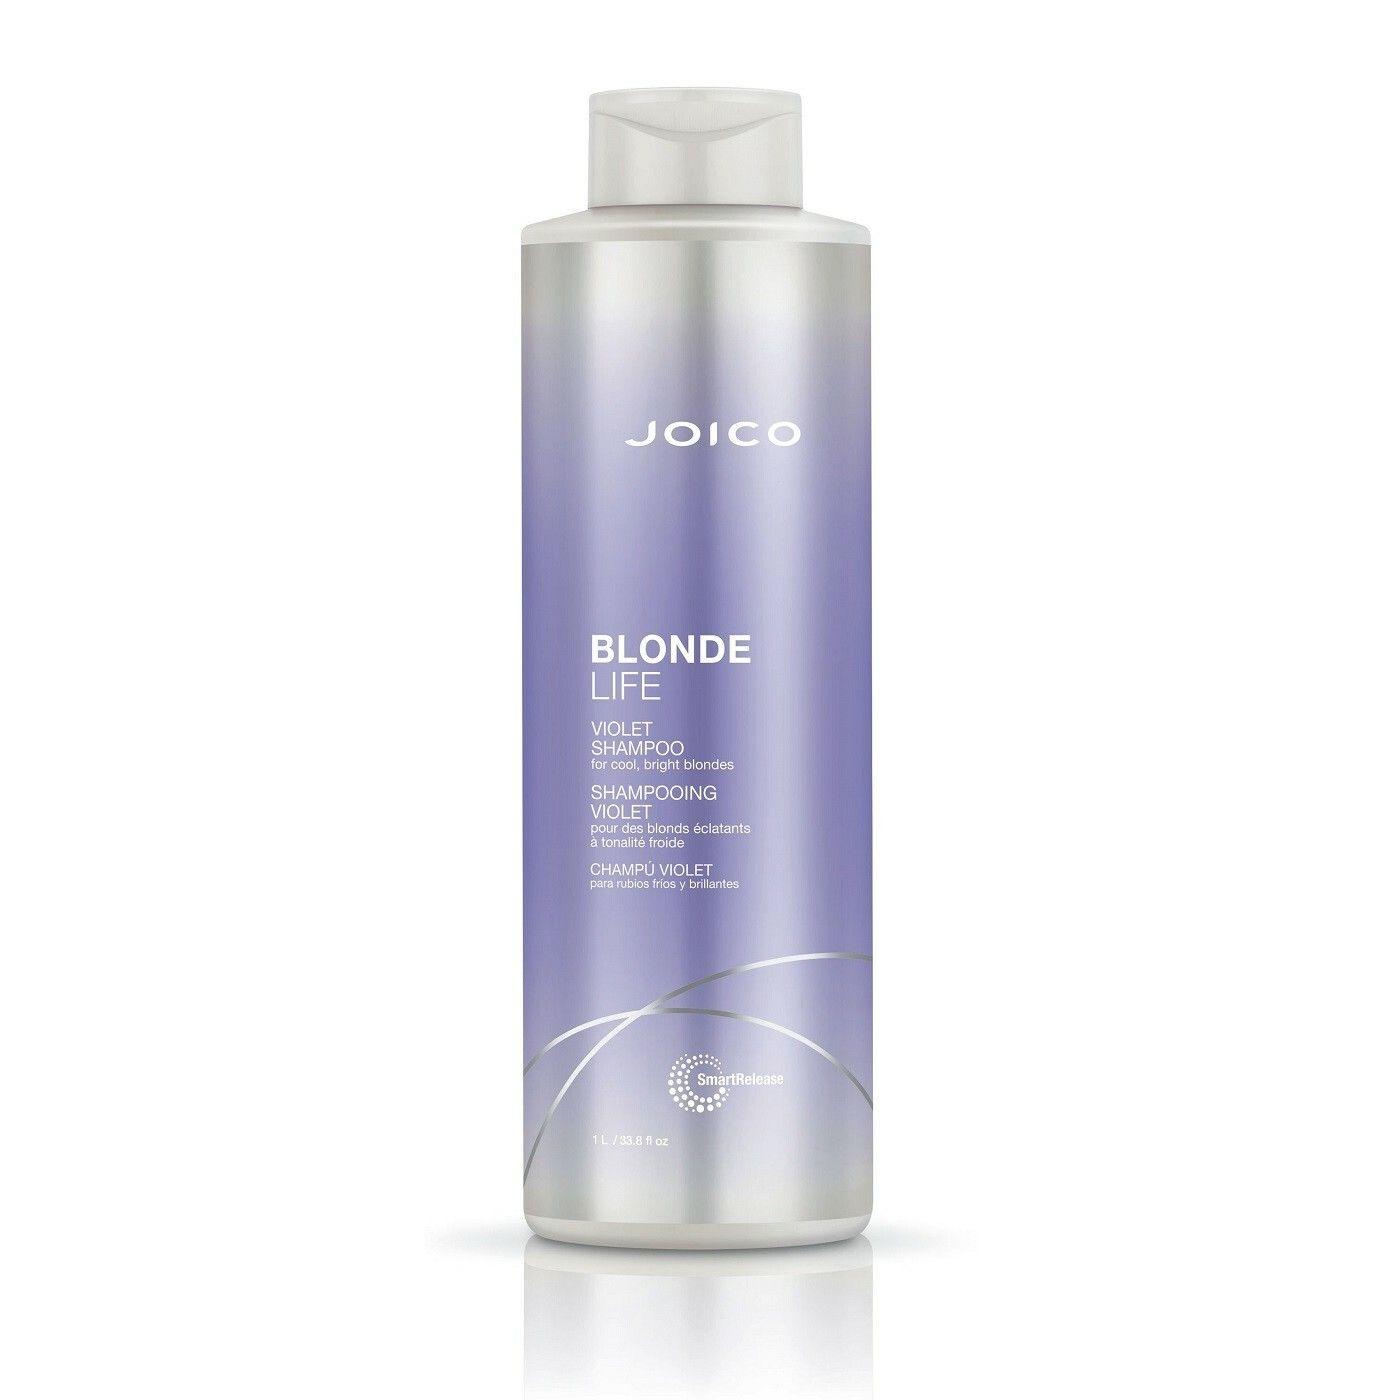 Joico Blonde Life Violet Shampoo - 300ml